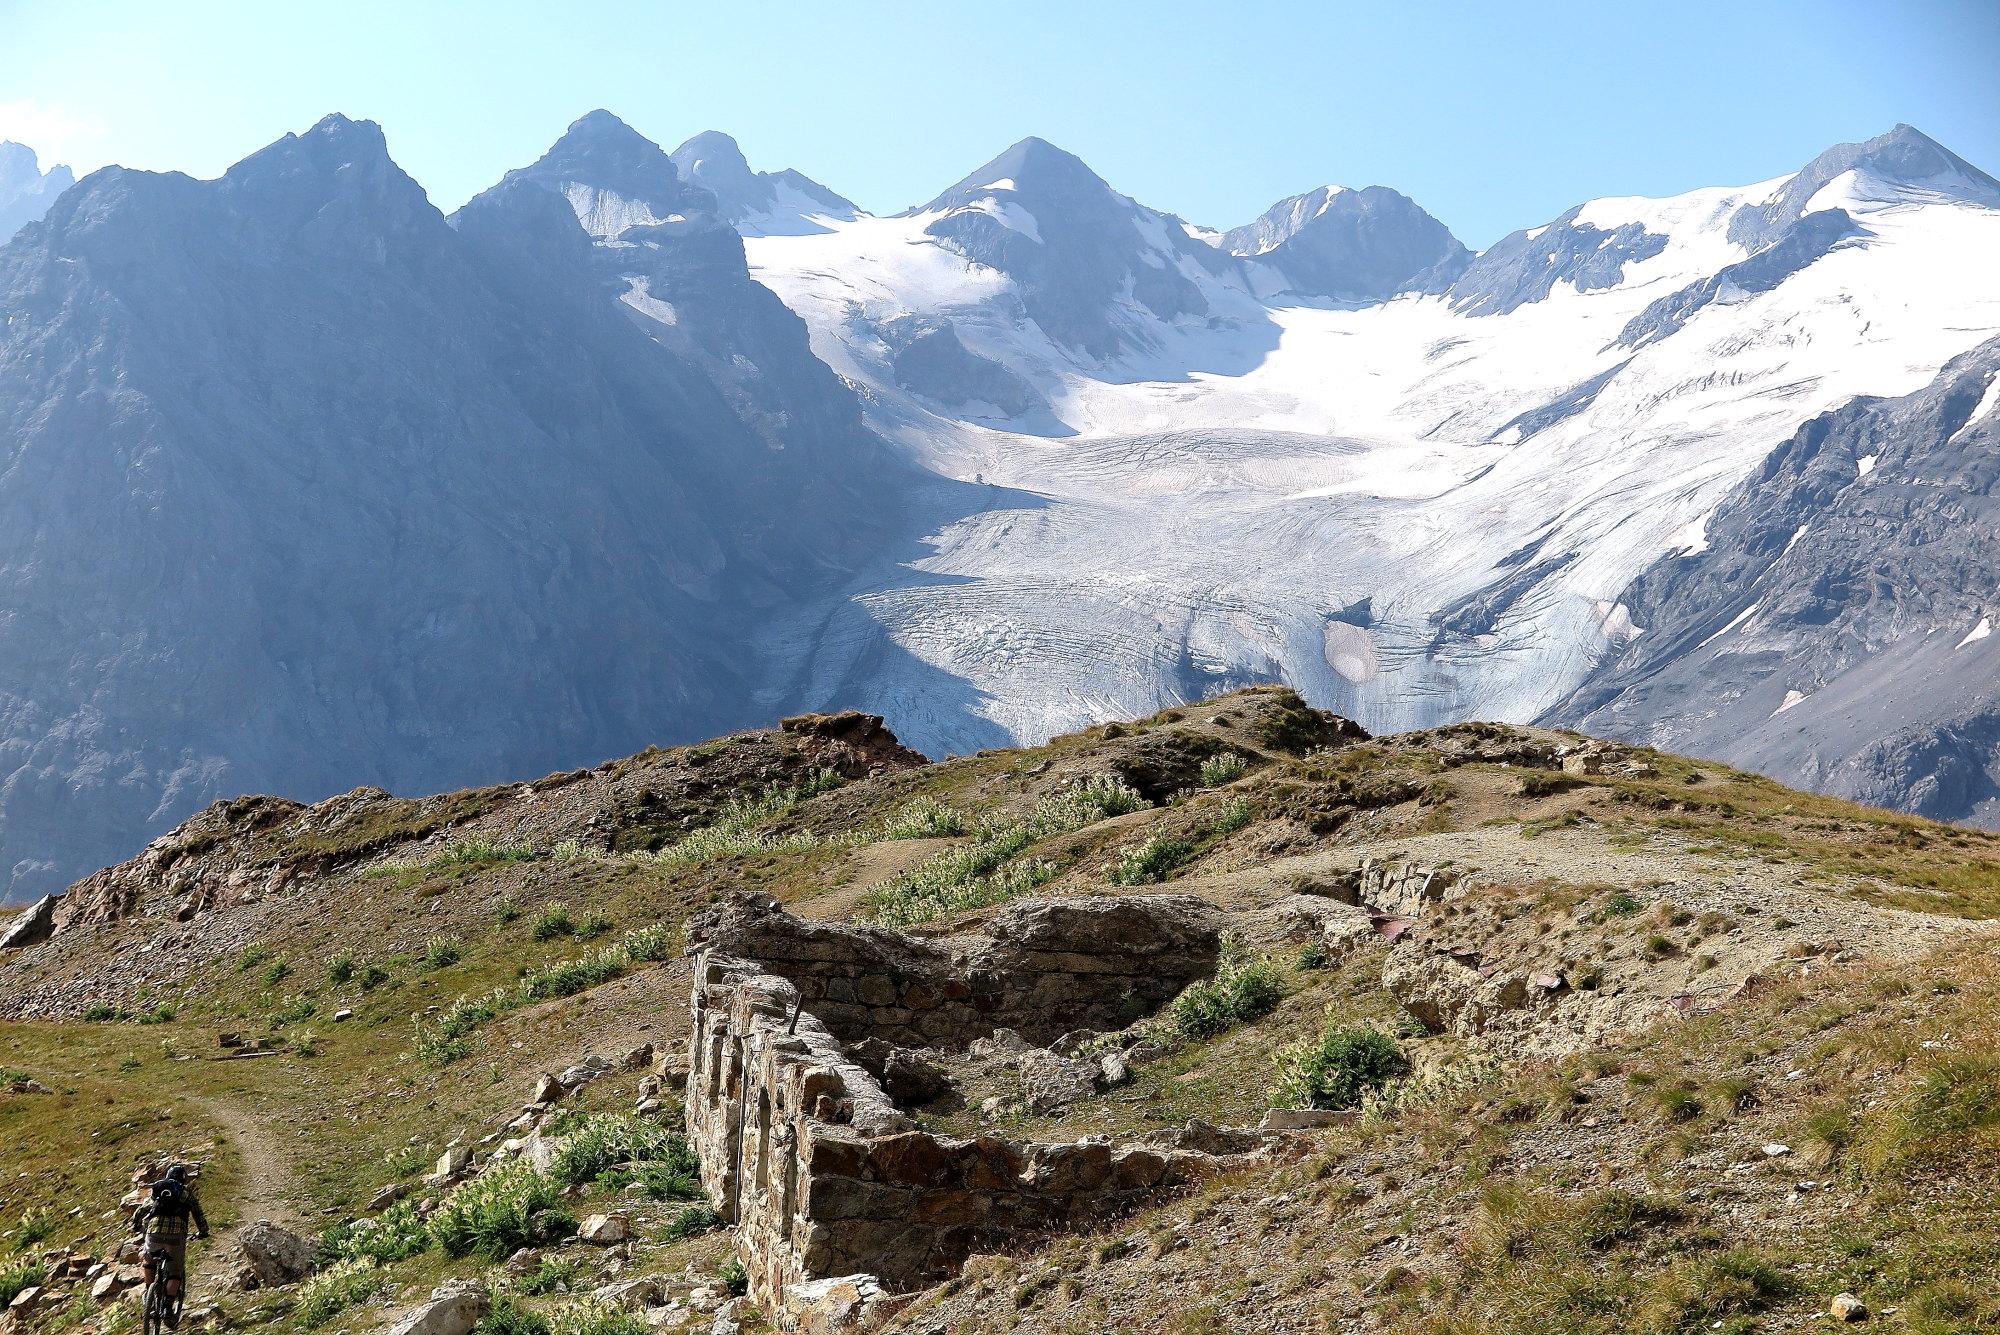 Ride Alpine Trails Mountainbike Freeride & Enduro Camp MTB Freeride Indivuelle Tourenplanung Enduro Transalp Ride on